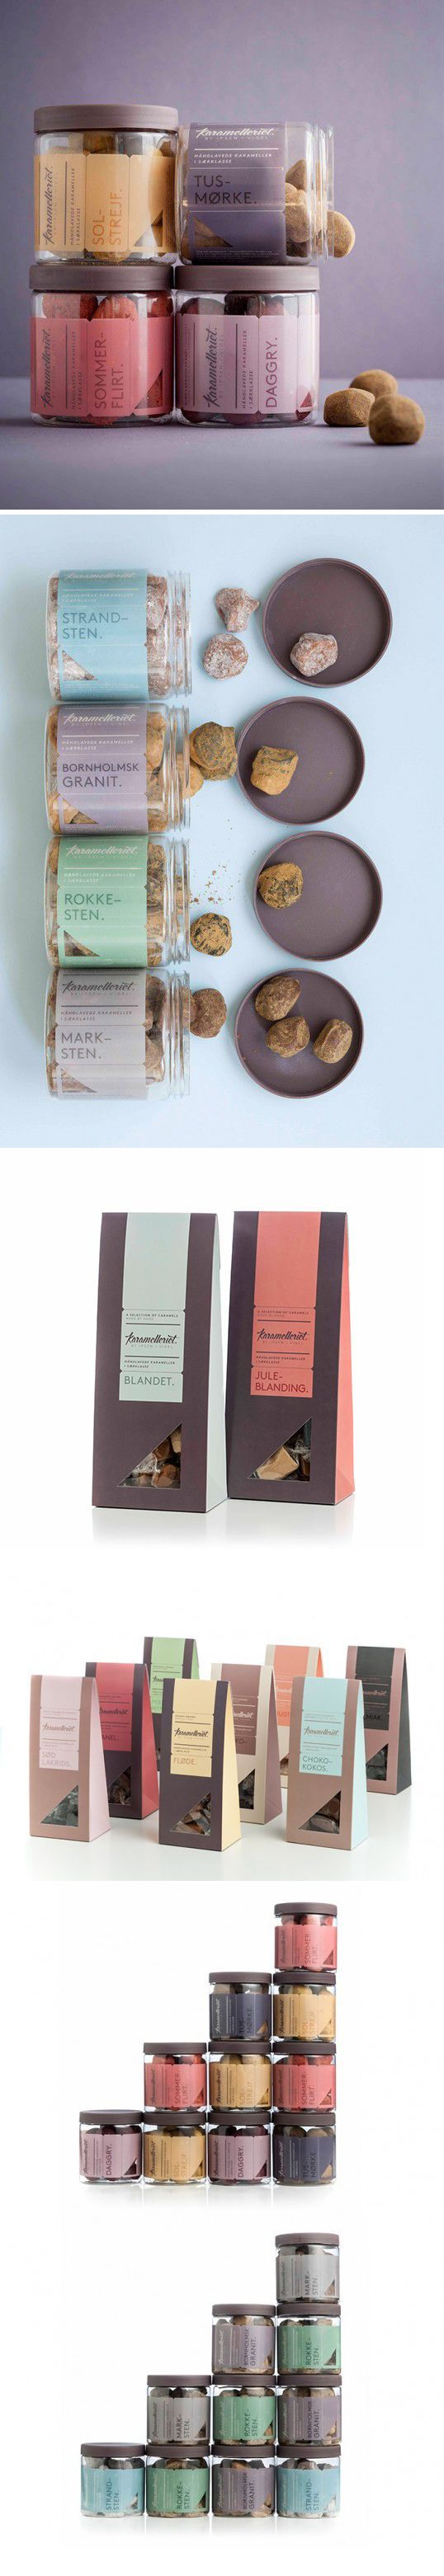 #Packaging para bombones, trufas y chocolates varios Karamelleriet ¿quién se resiste?